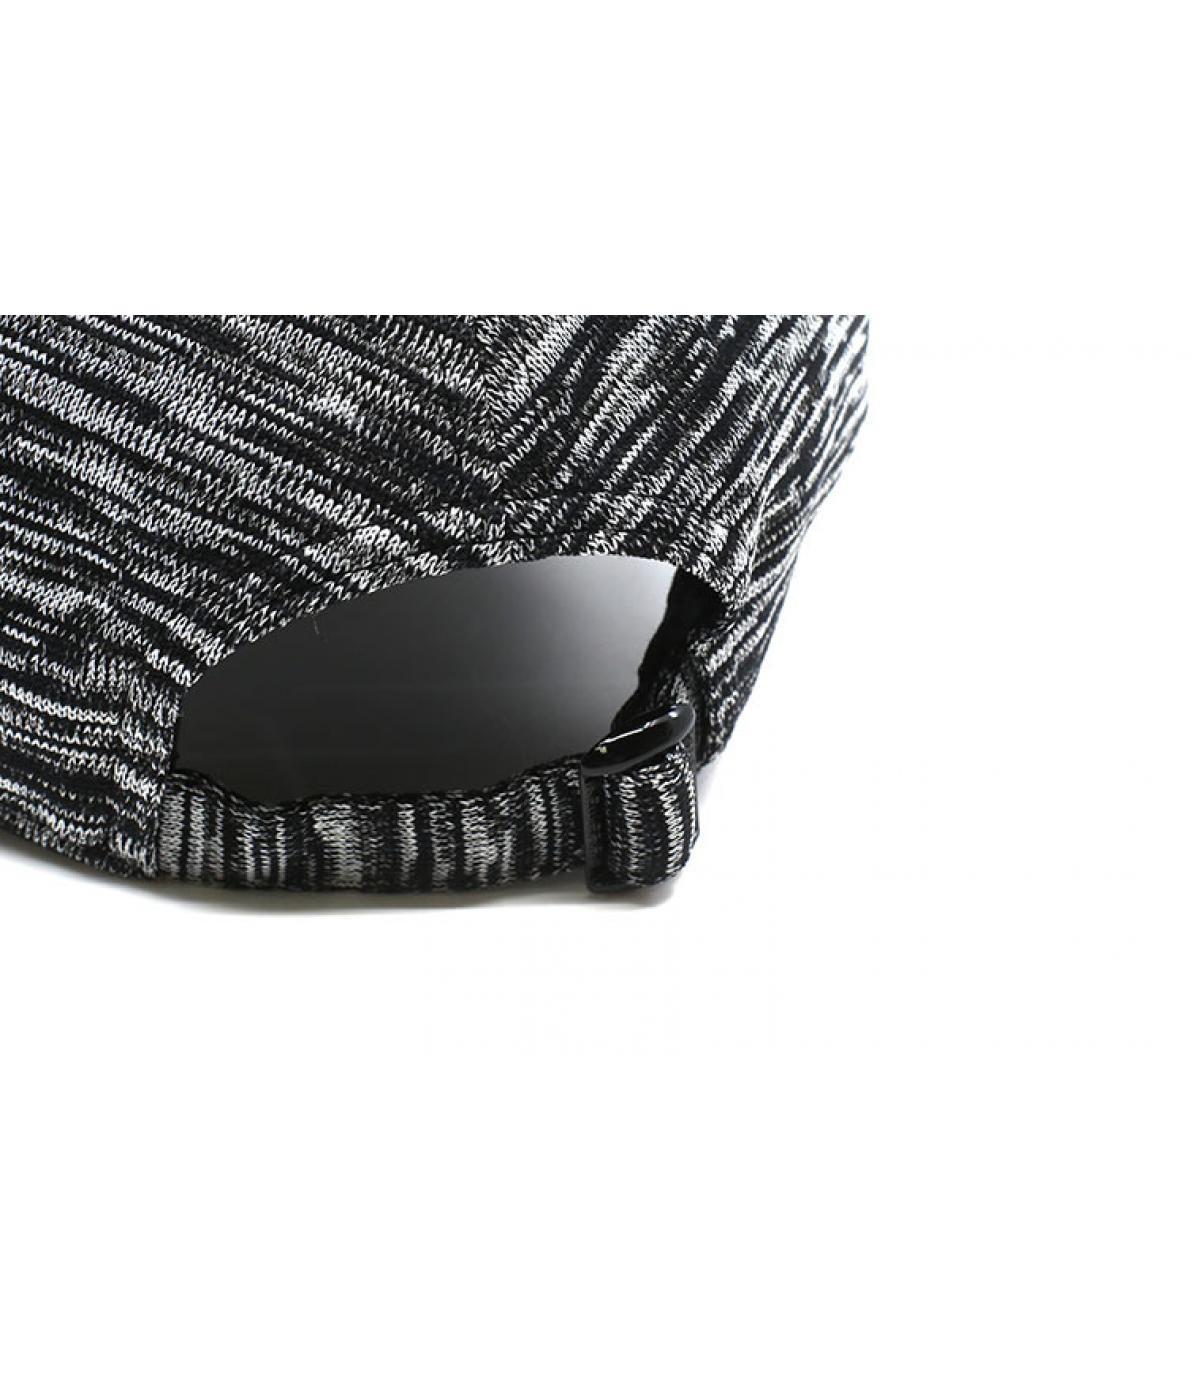 Details Cap Engineered Fit LA 9Forty black - Abbildung 5